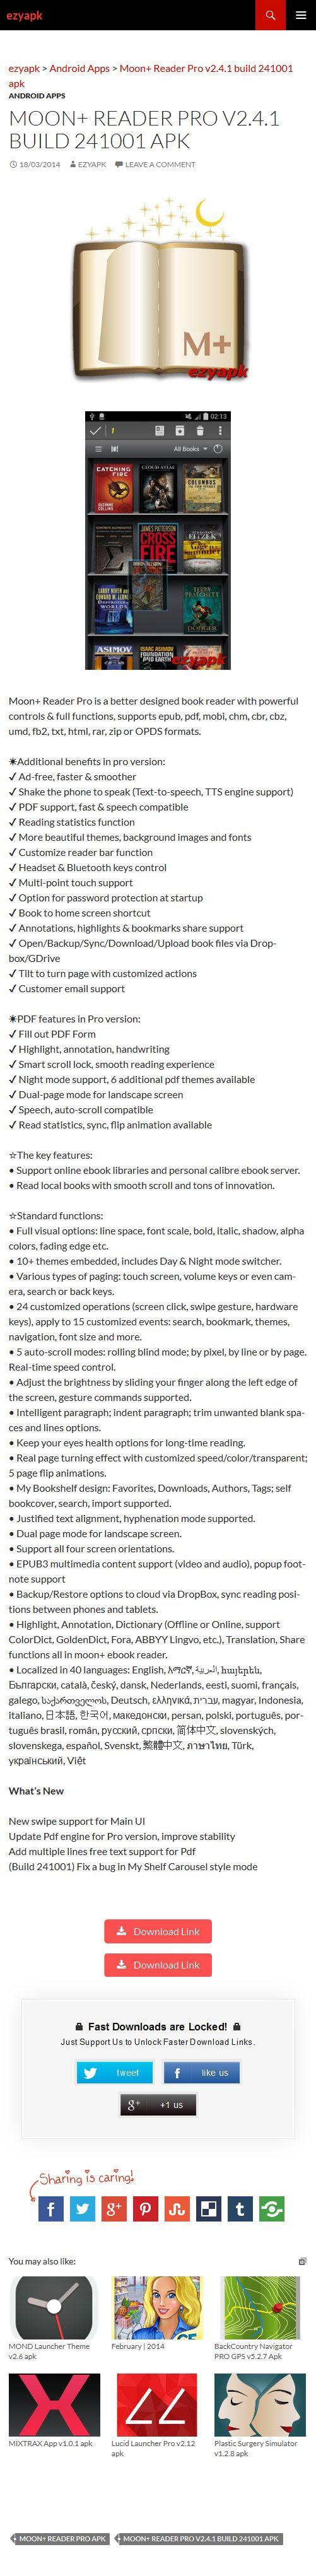 Android Apps Moon+ Reader Pro v2.4.1 build 241001 apk - ezyapk Moon+ Reader Pro is a better book reader with powerful controls & full functions, supports epub, pdf, mobi, chm, cbr, cbz, umd, fb2, txt, html, rar, etc. http://www.ezyapk.com/android-apps/moon-reader-pro-v2-4-1-build-241001-apk/